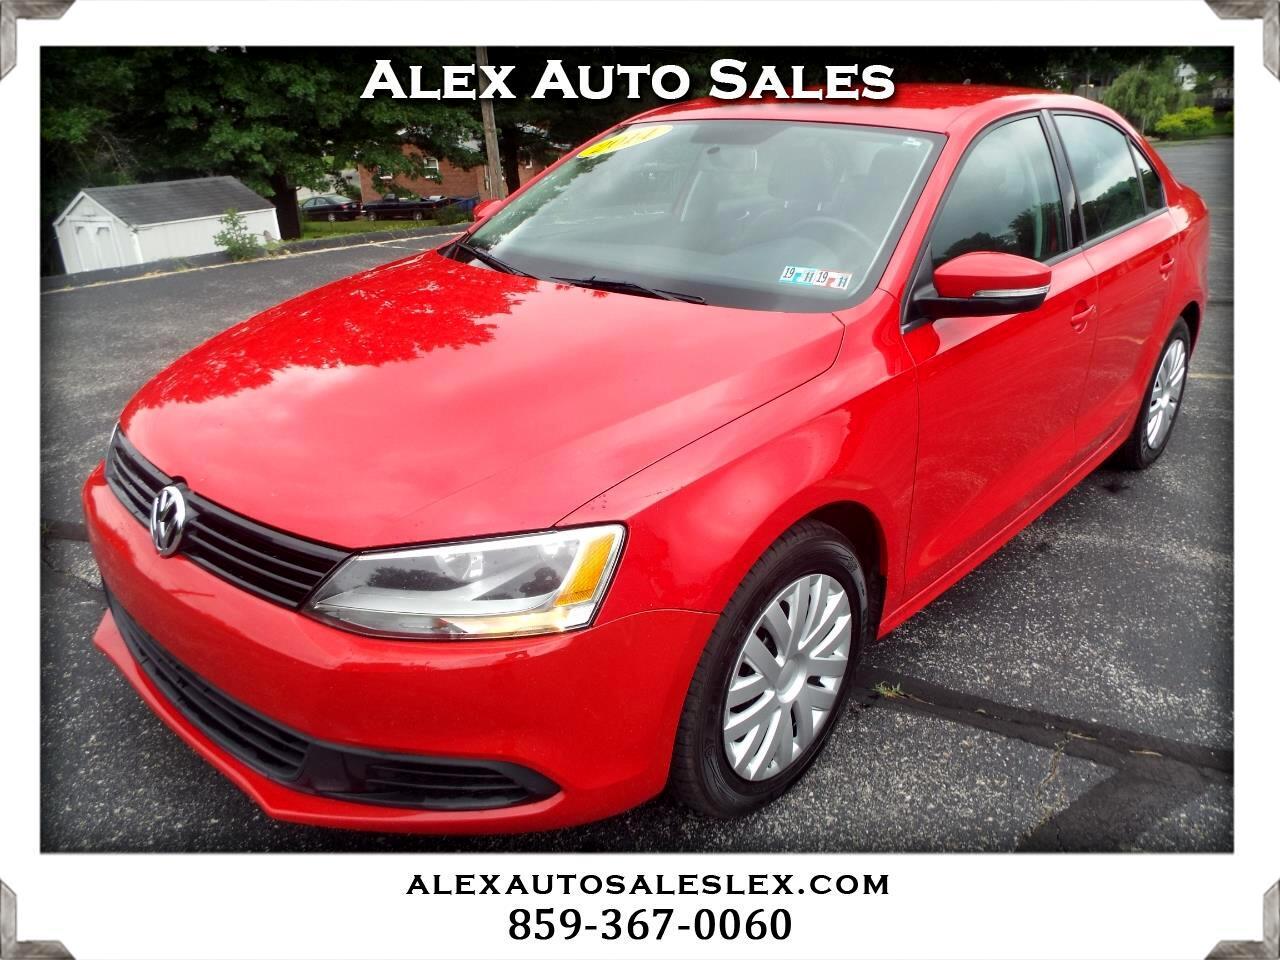 Used 2014 Volkswagen Jetta Se For Sale In Lexington Ky 40505 Alex Auto Sales